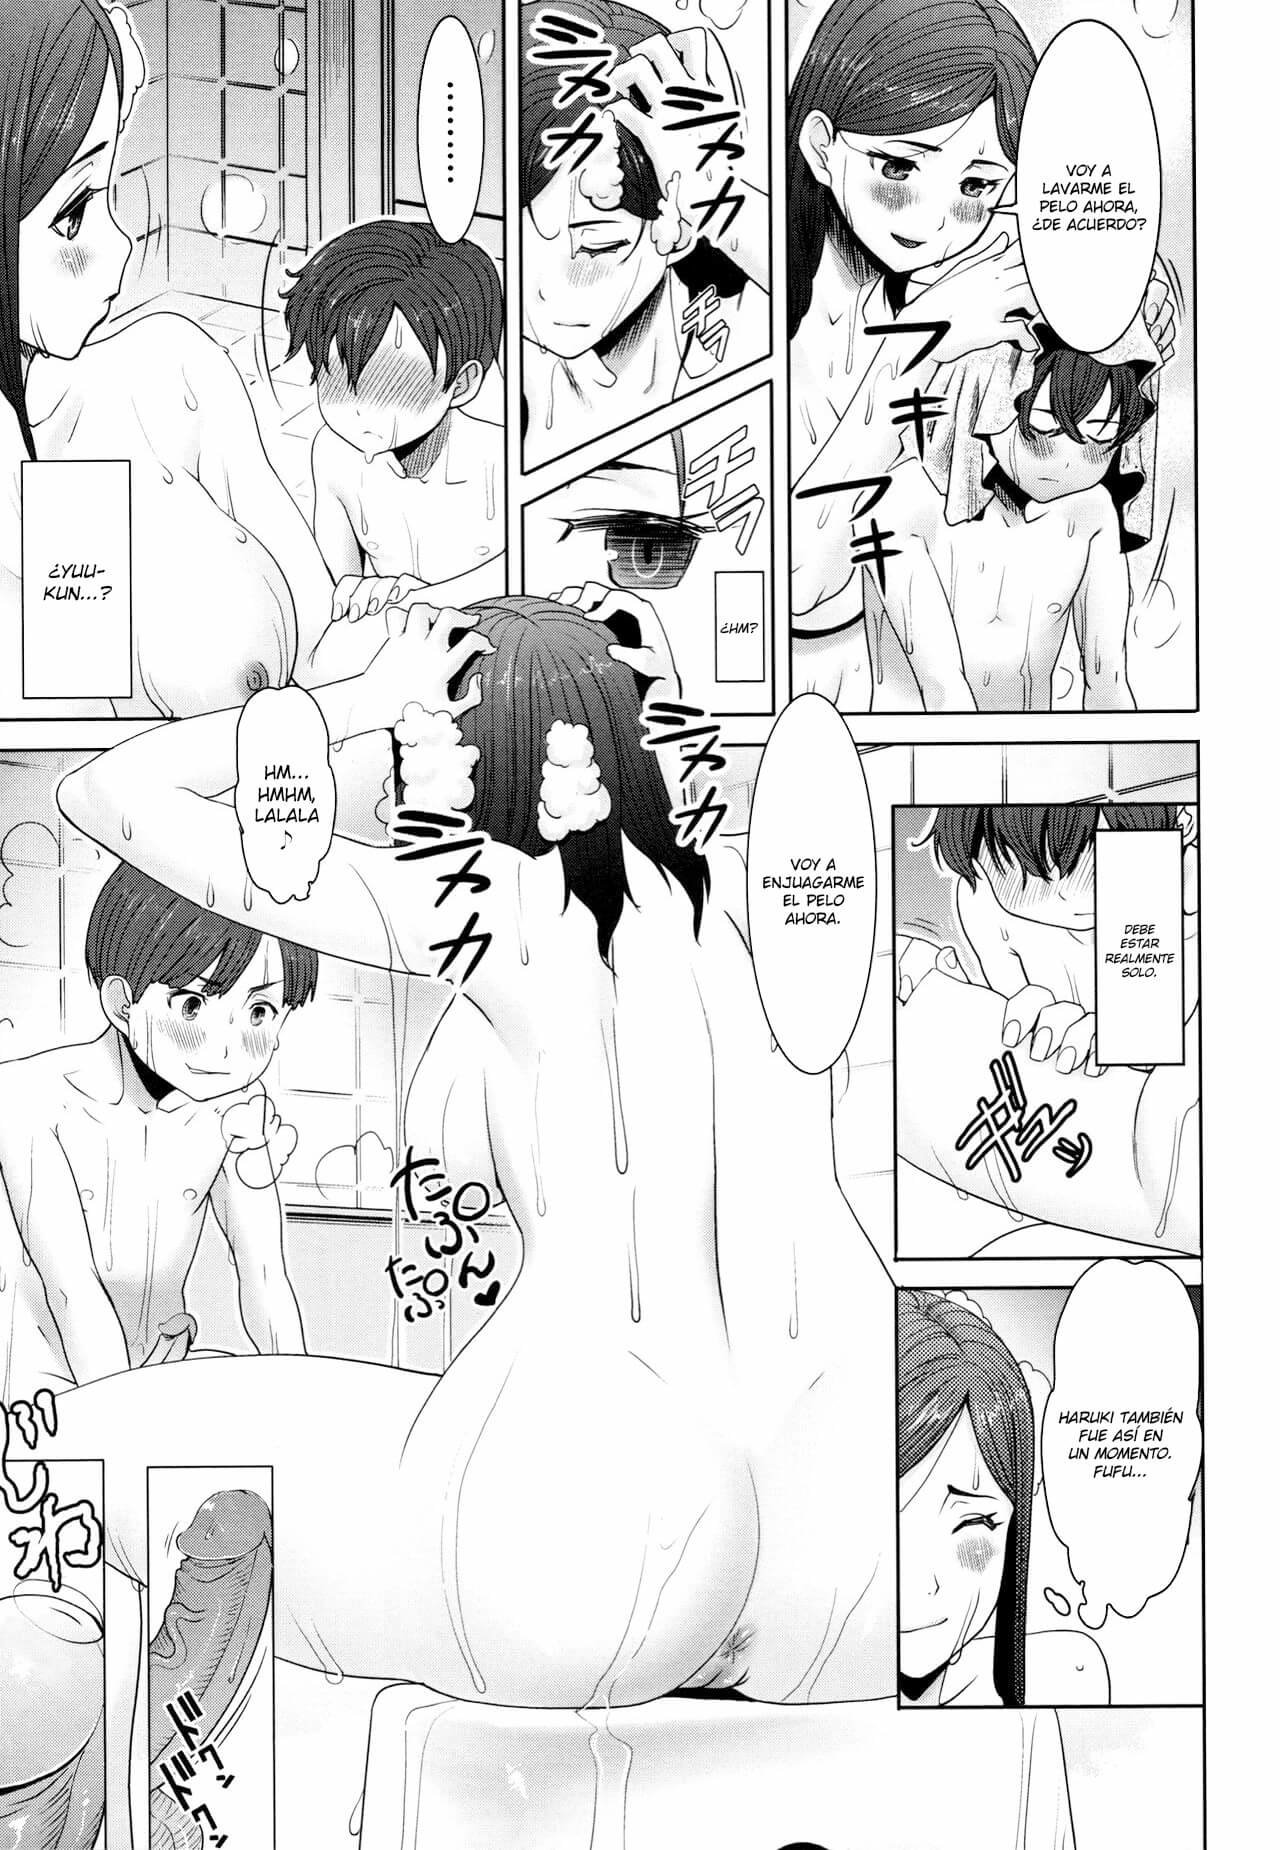 Asahina Ikka Netorareta Haha Tomoko Cap 1-3 - 10